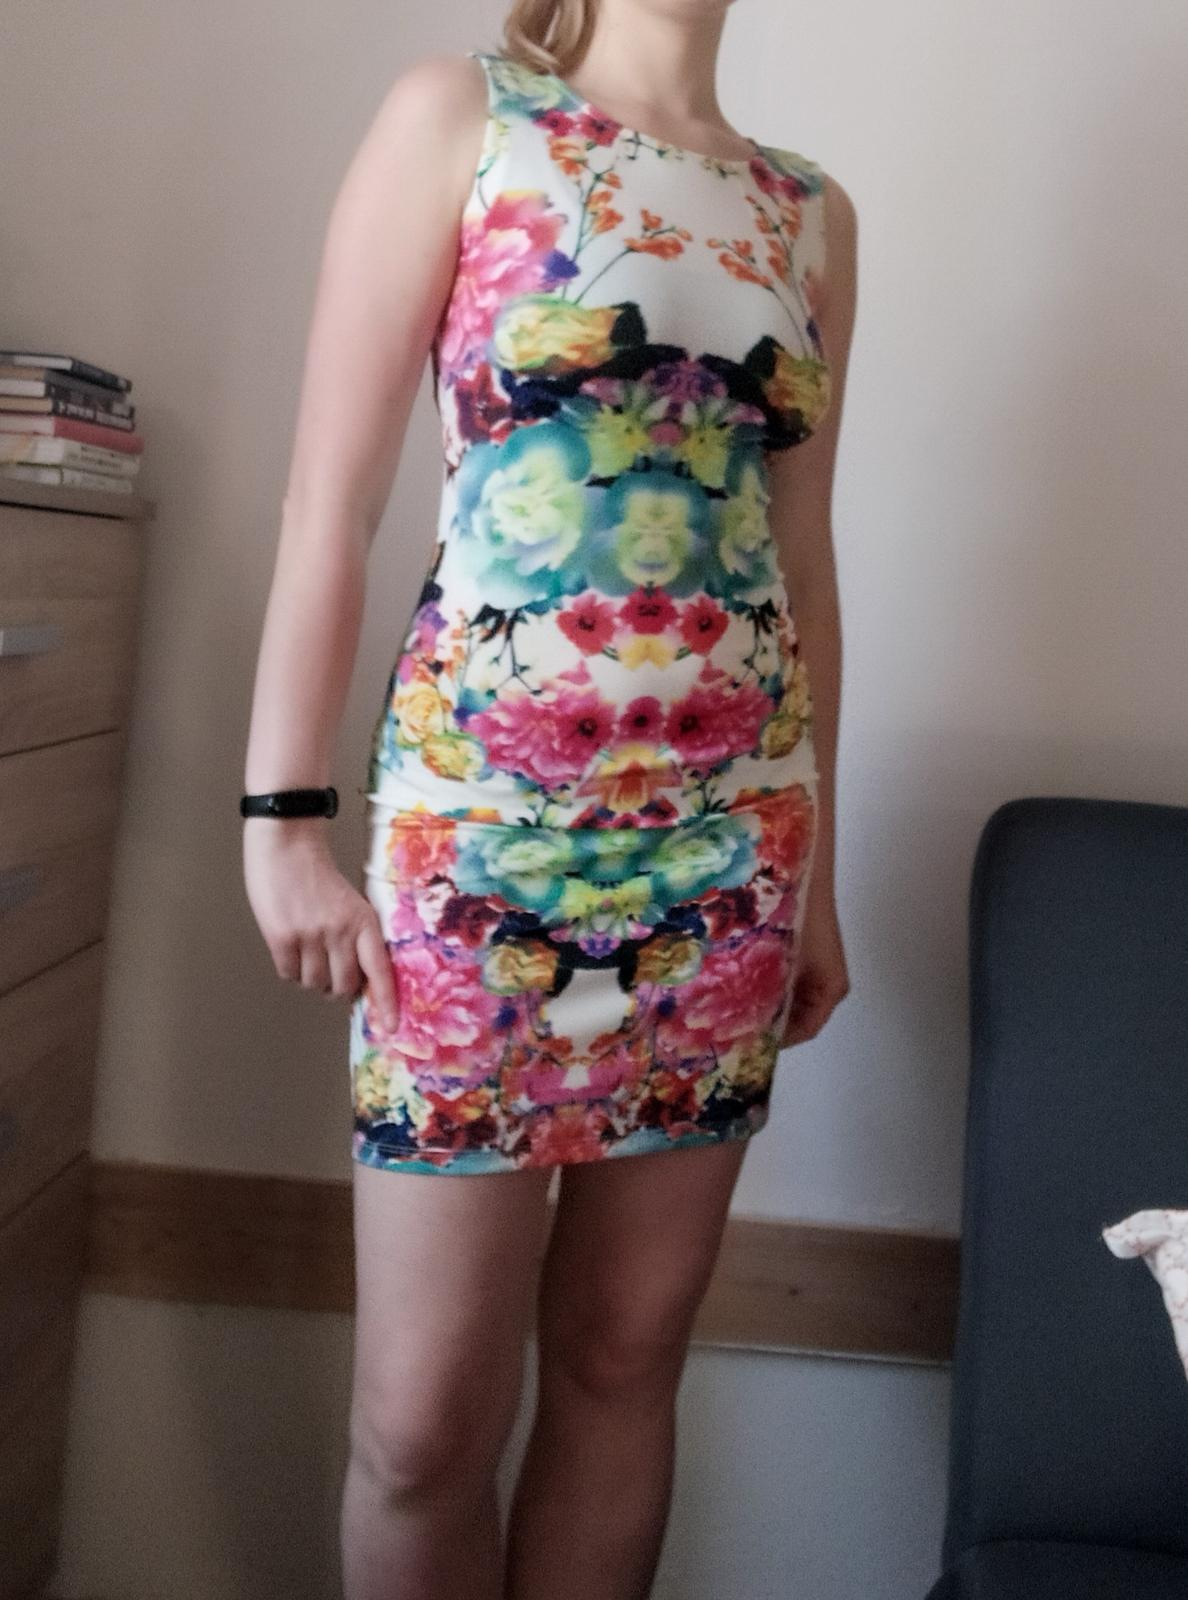 Barevné mini šaty na ramena - vel. S - Obrázek č. 1